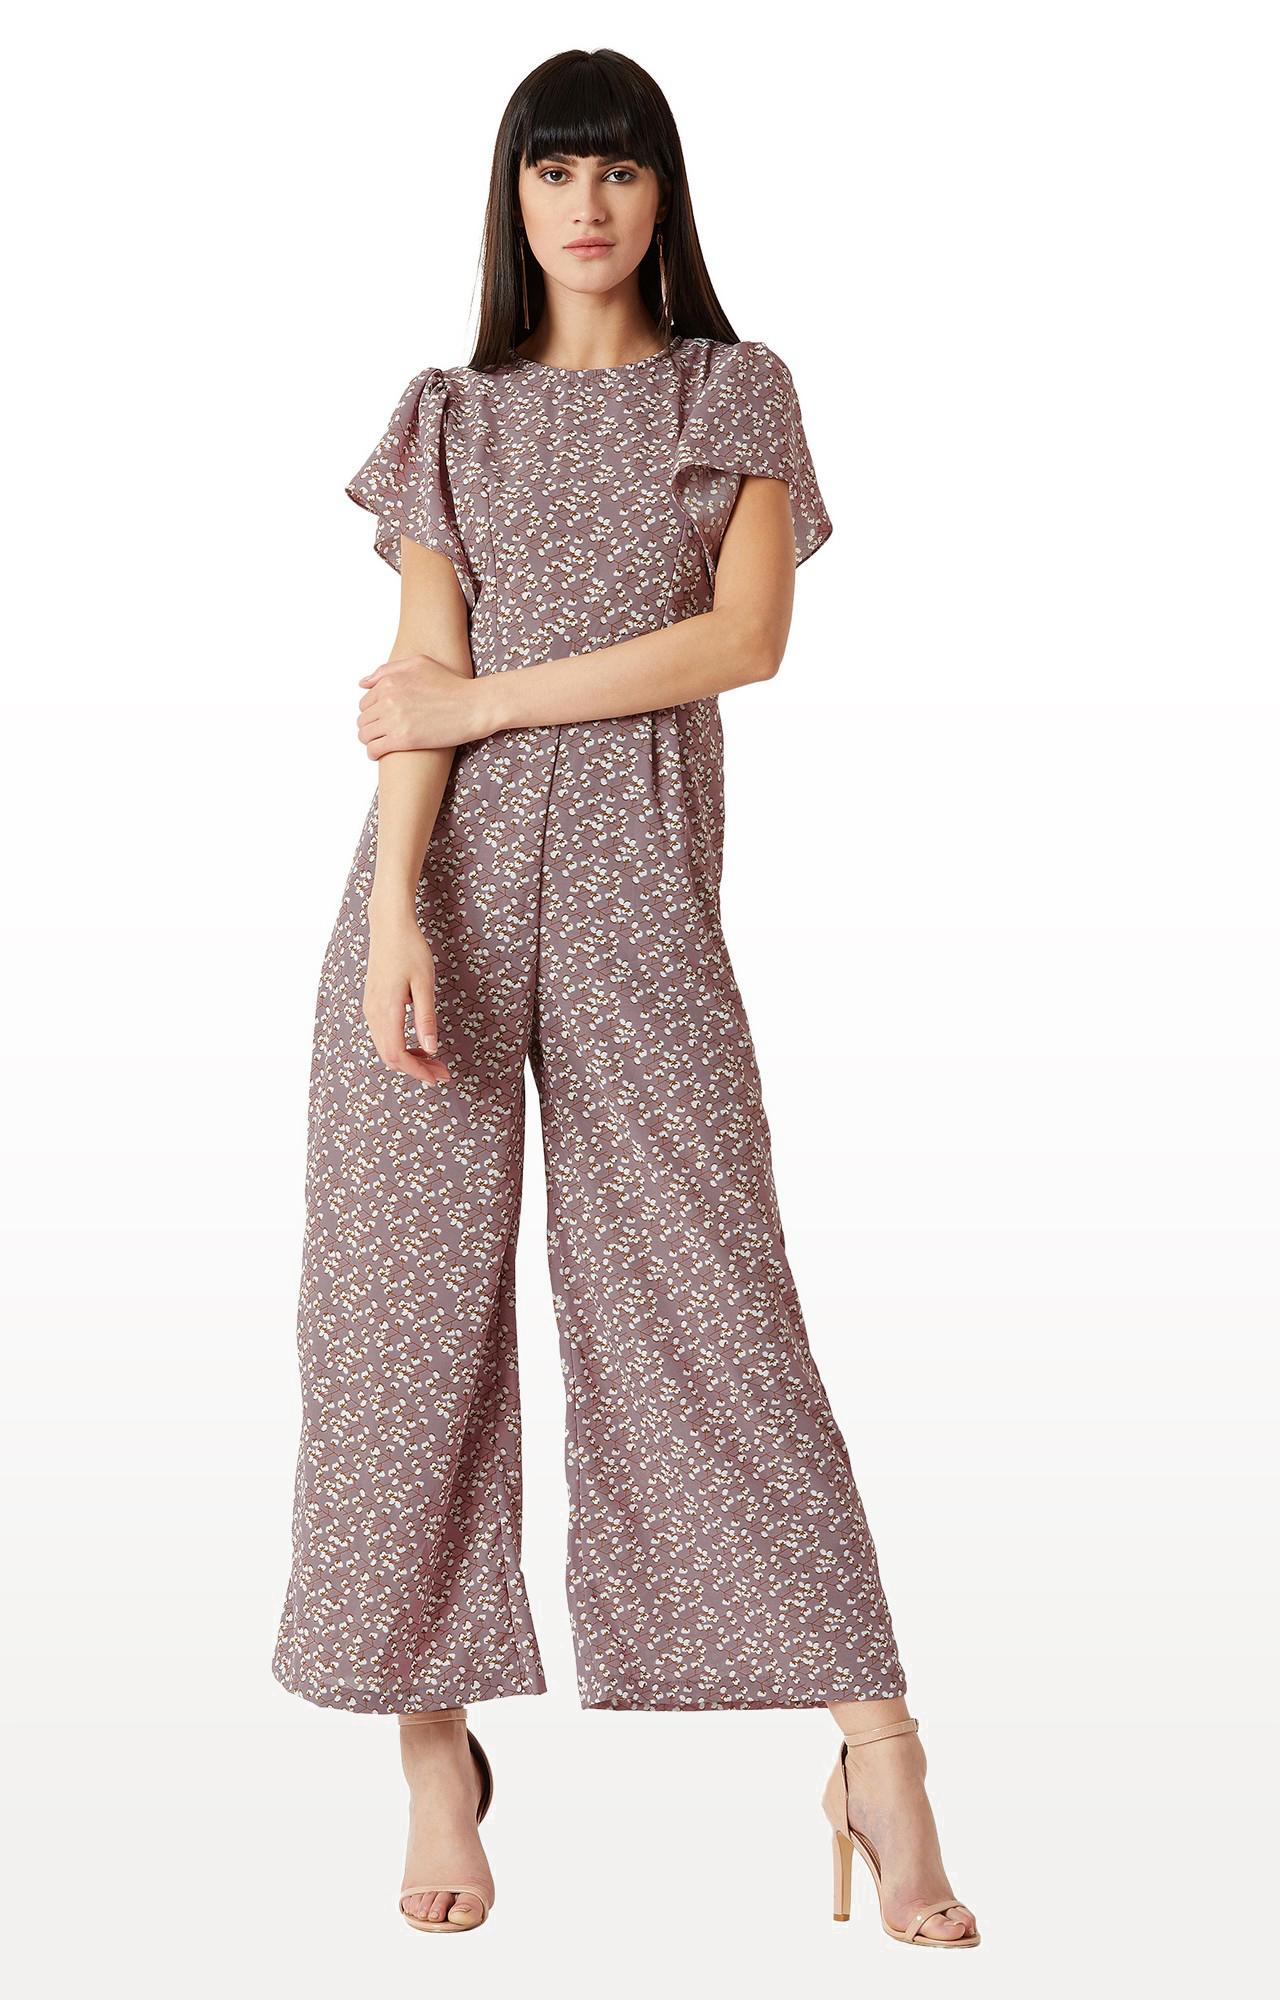 MISS CHASE   Mauve Floral Ruffled Half Sleeve Regular Length Wide Leg Jumpsuit